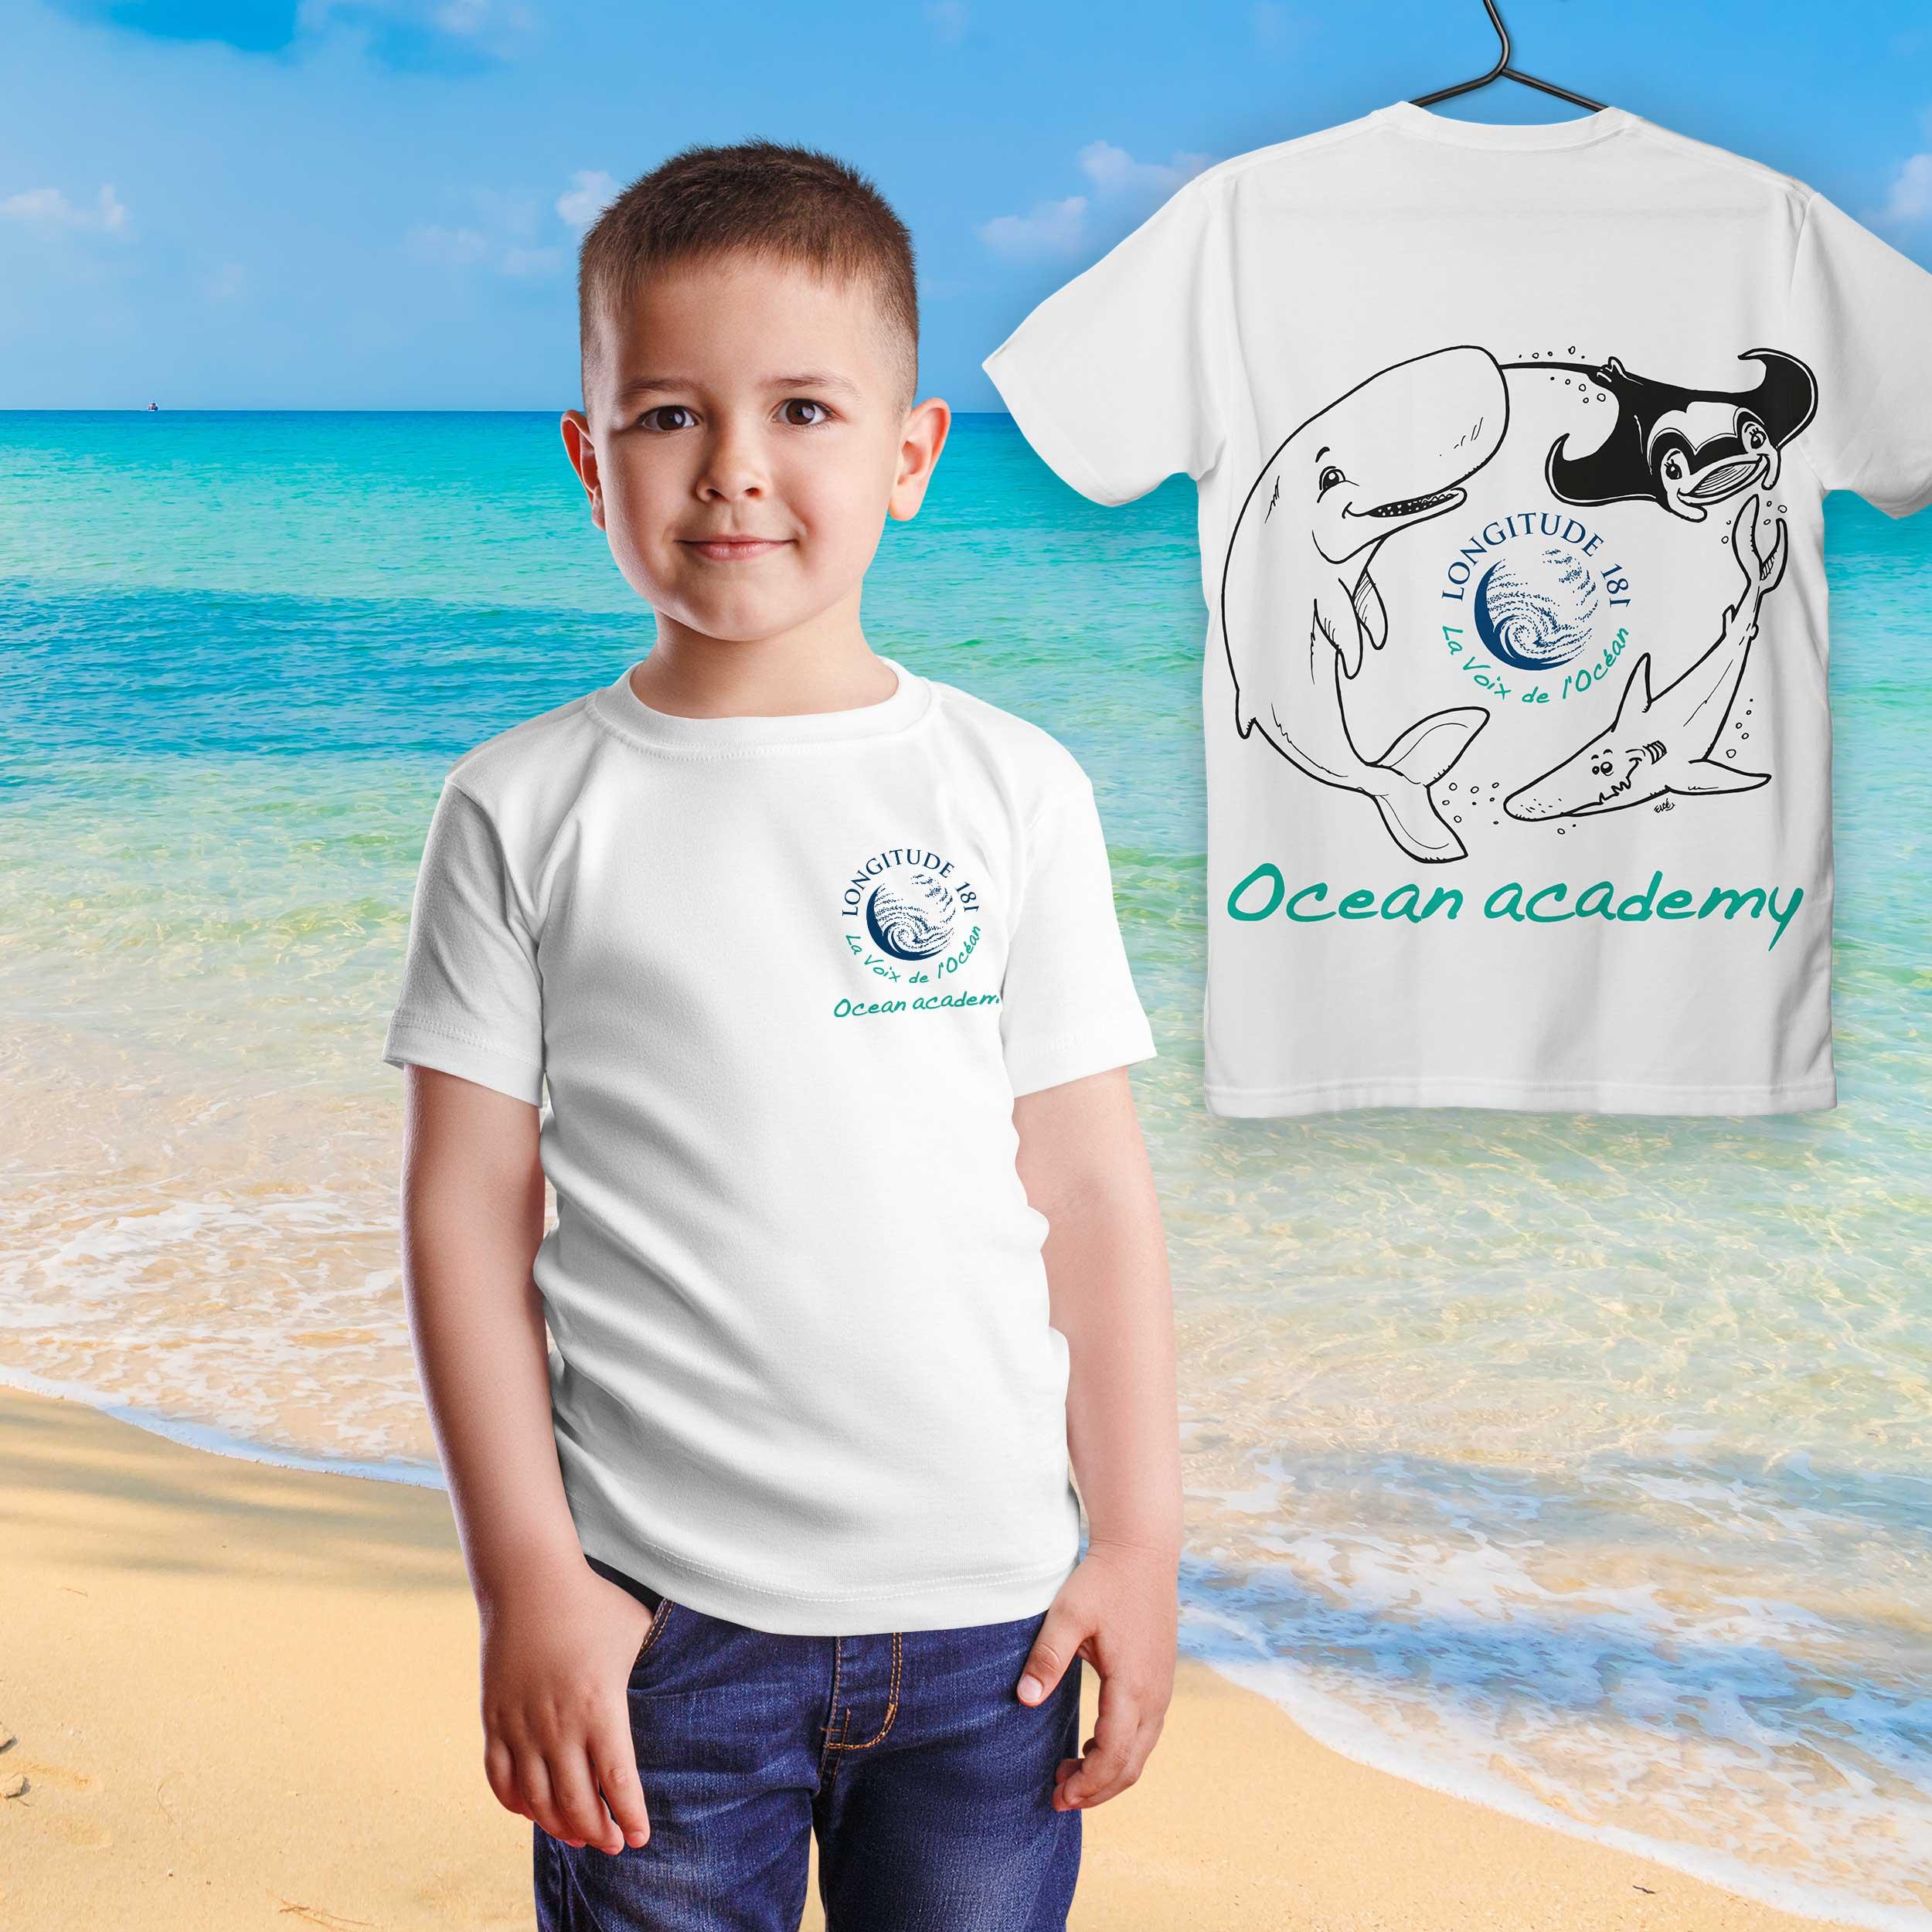 MESit Longitude T shirt enfant garcon ocean academy